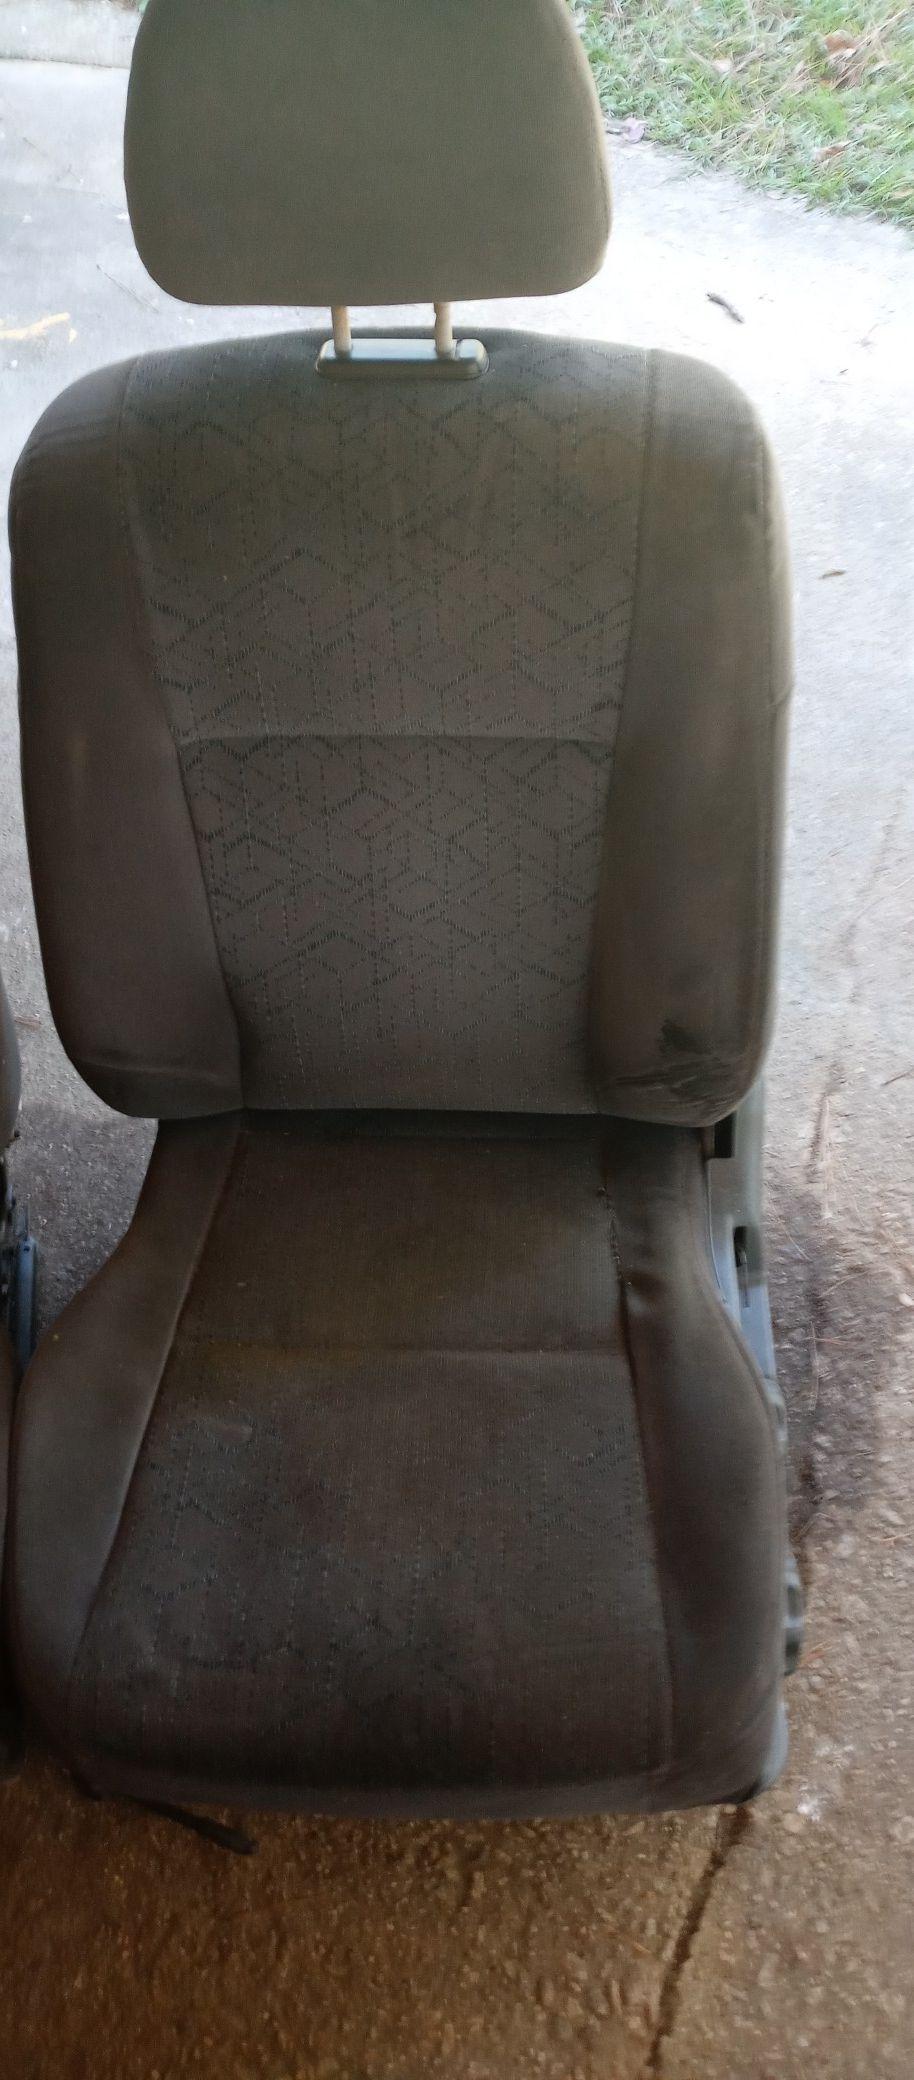 Ek 99-00 front seats